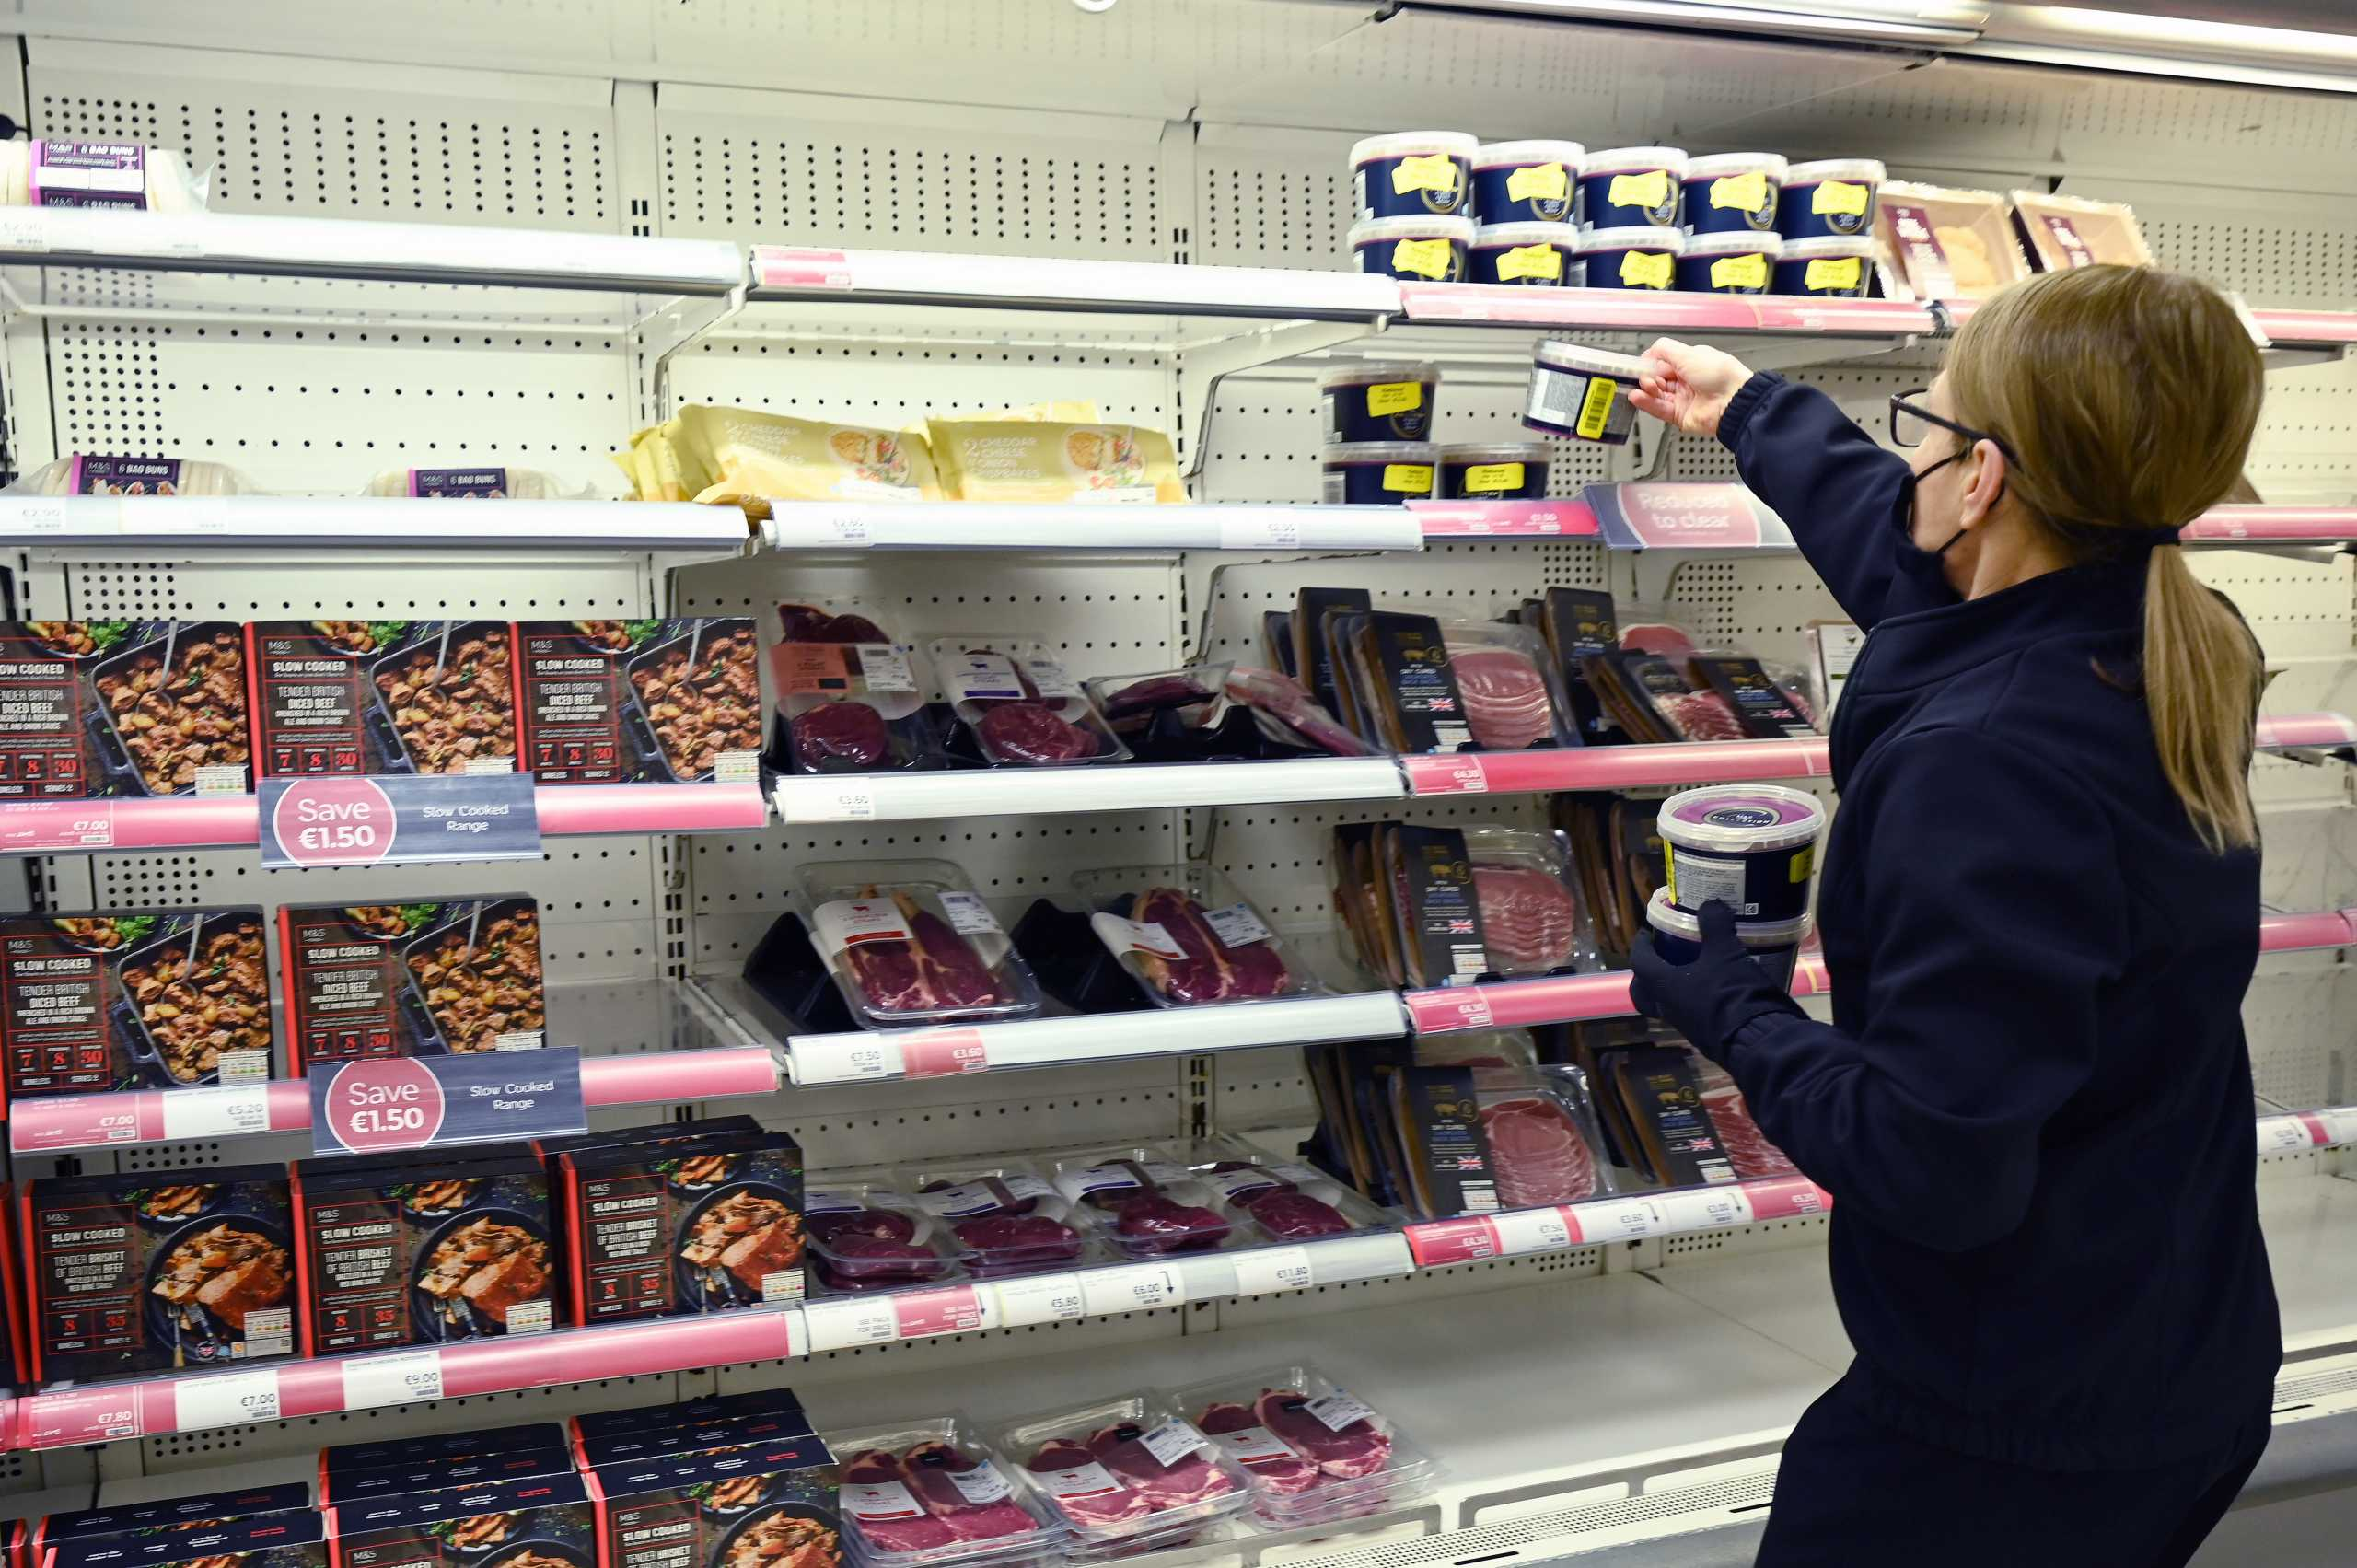 Brexit: Τεράστιο πρόβλημα με την τροφοδοσία των σούπερ μάρκετ στη Βόρεια Ιρλανδία